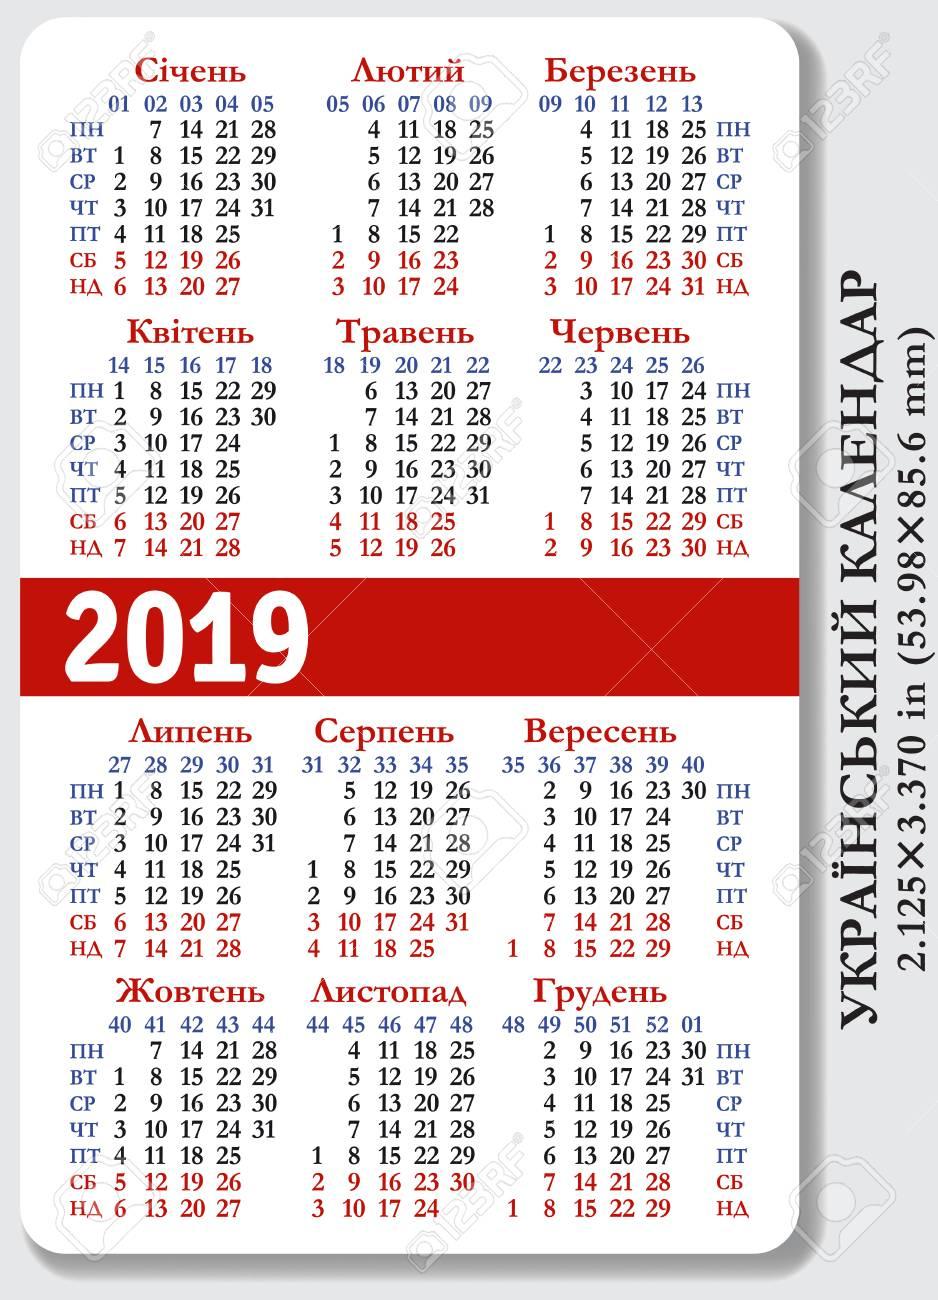 Ukrainian Pocket Calendar For 2019, Standard Size Iso 7810 Id-1,..